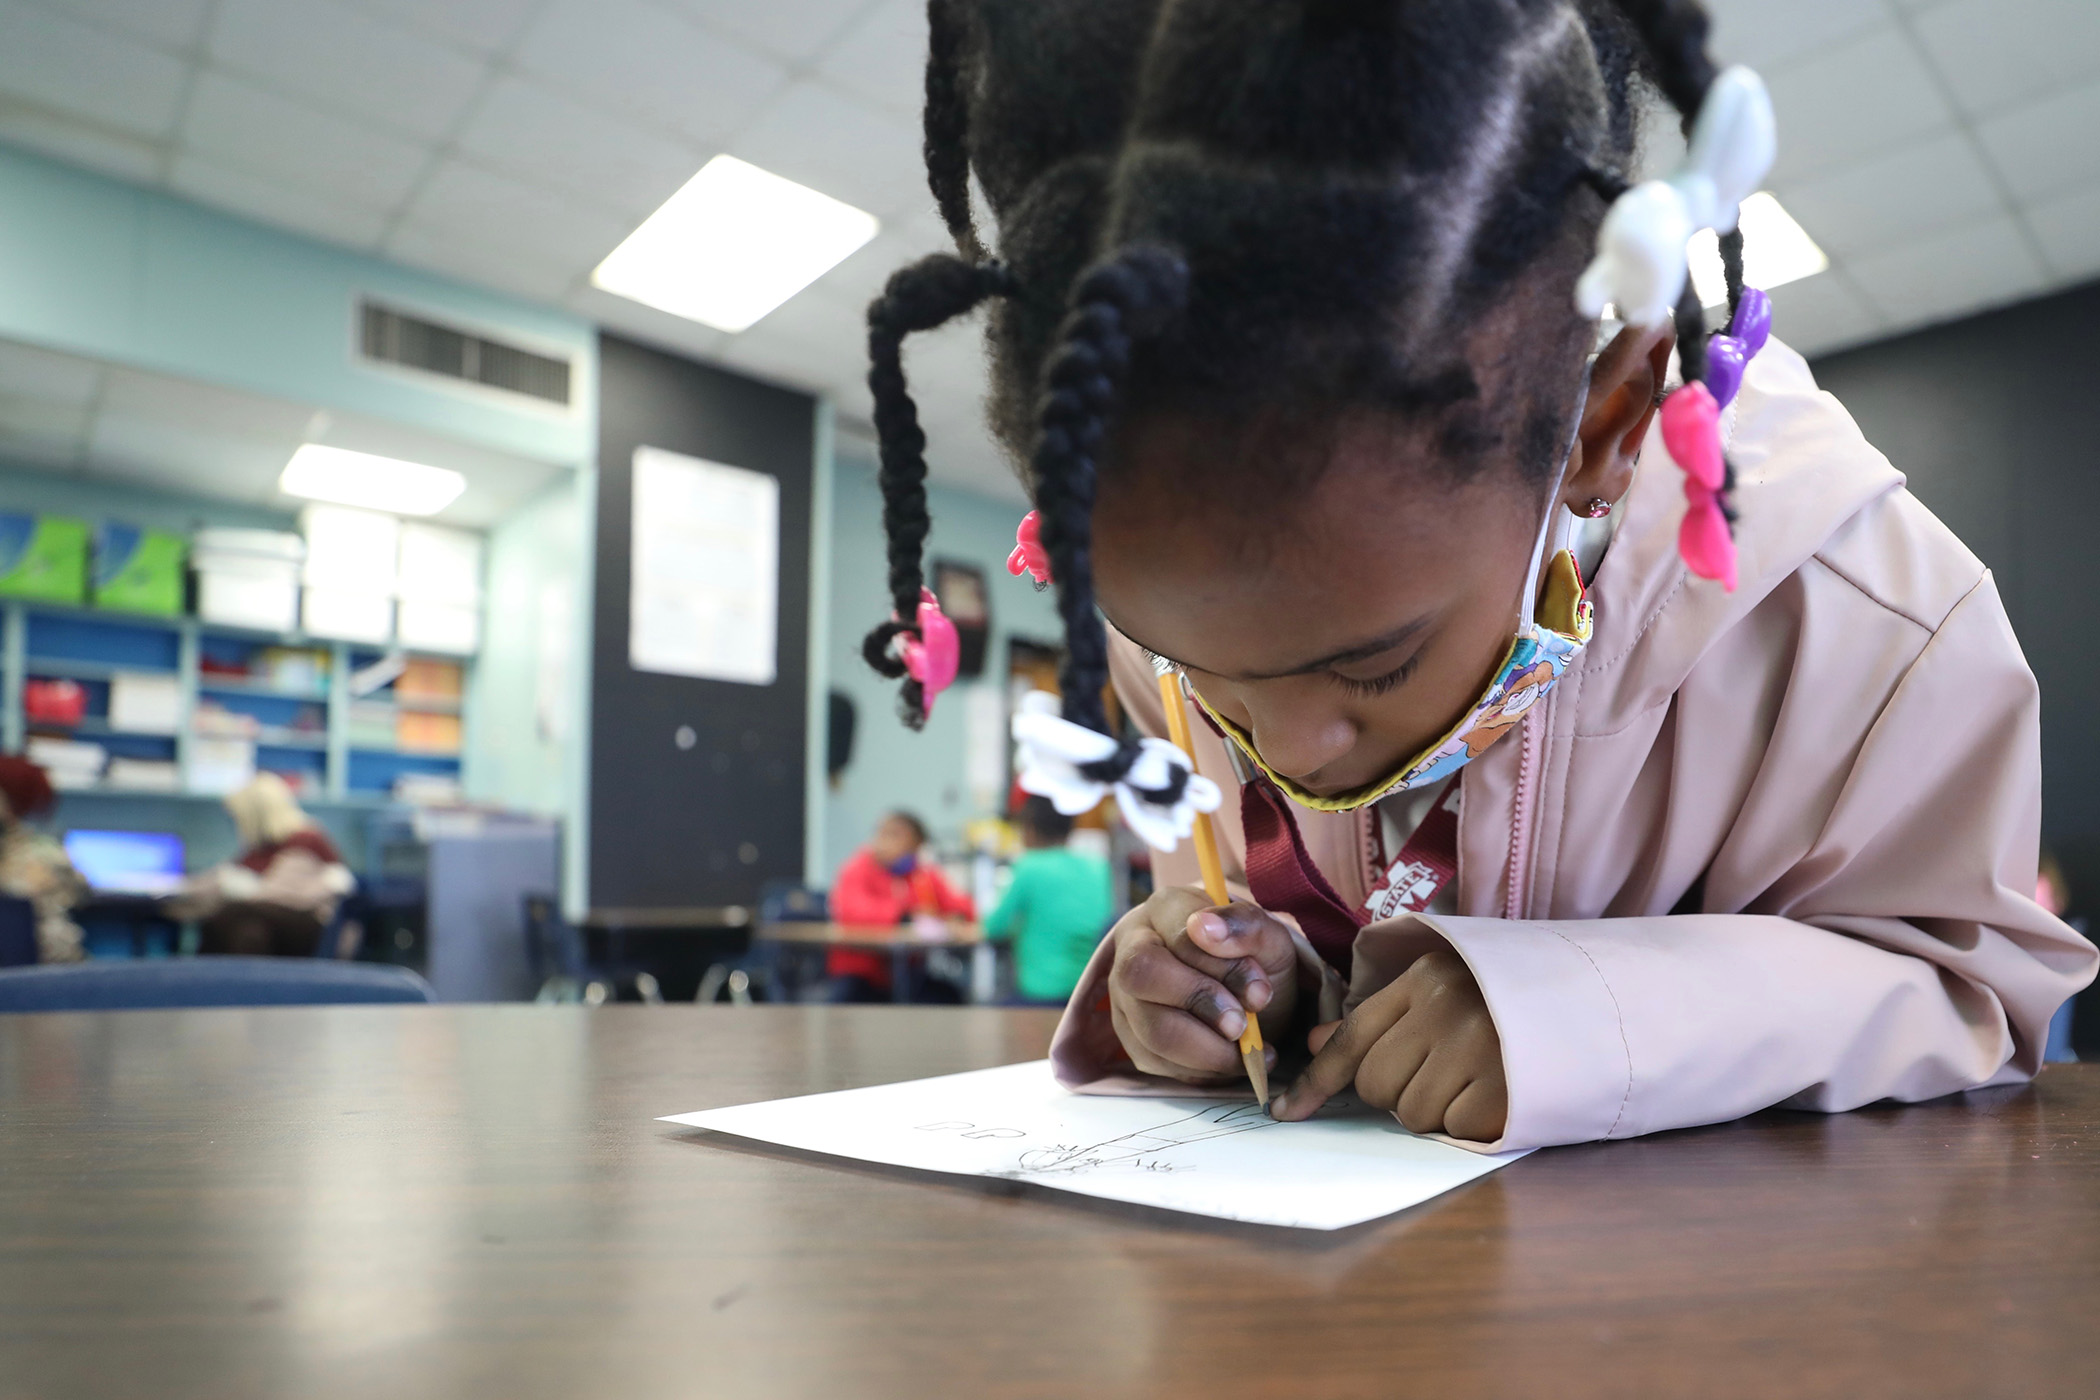 QLE art student focuses on her work.